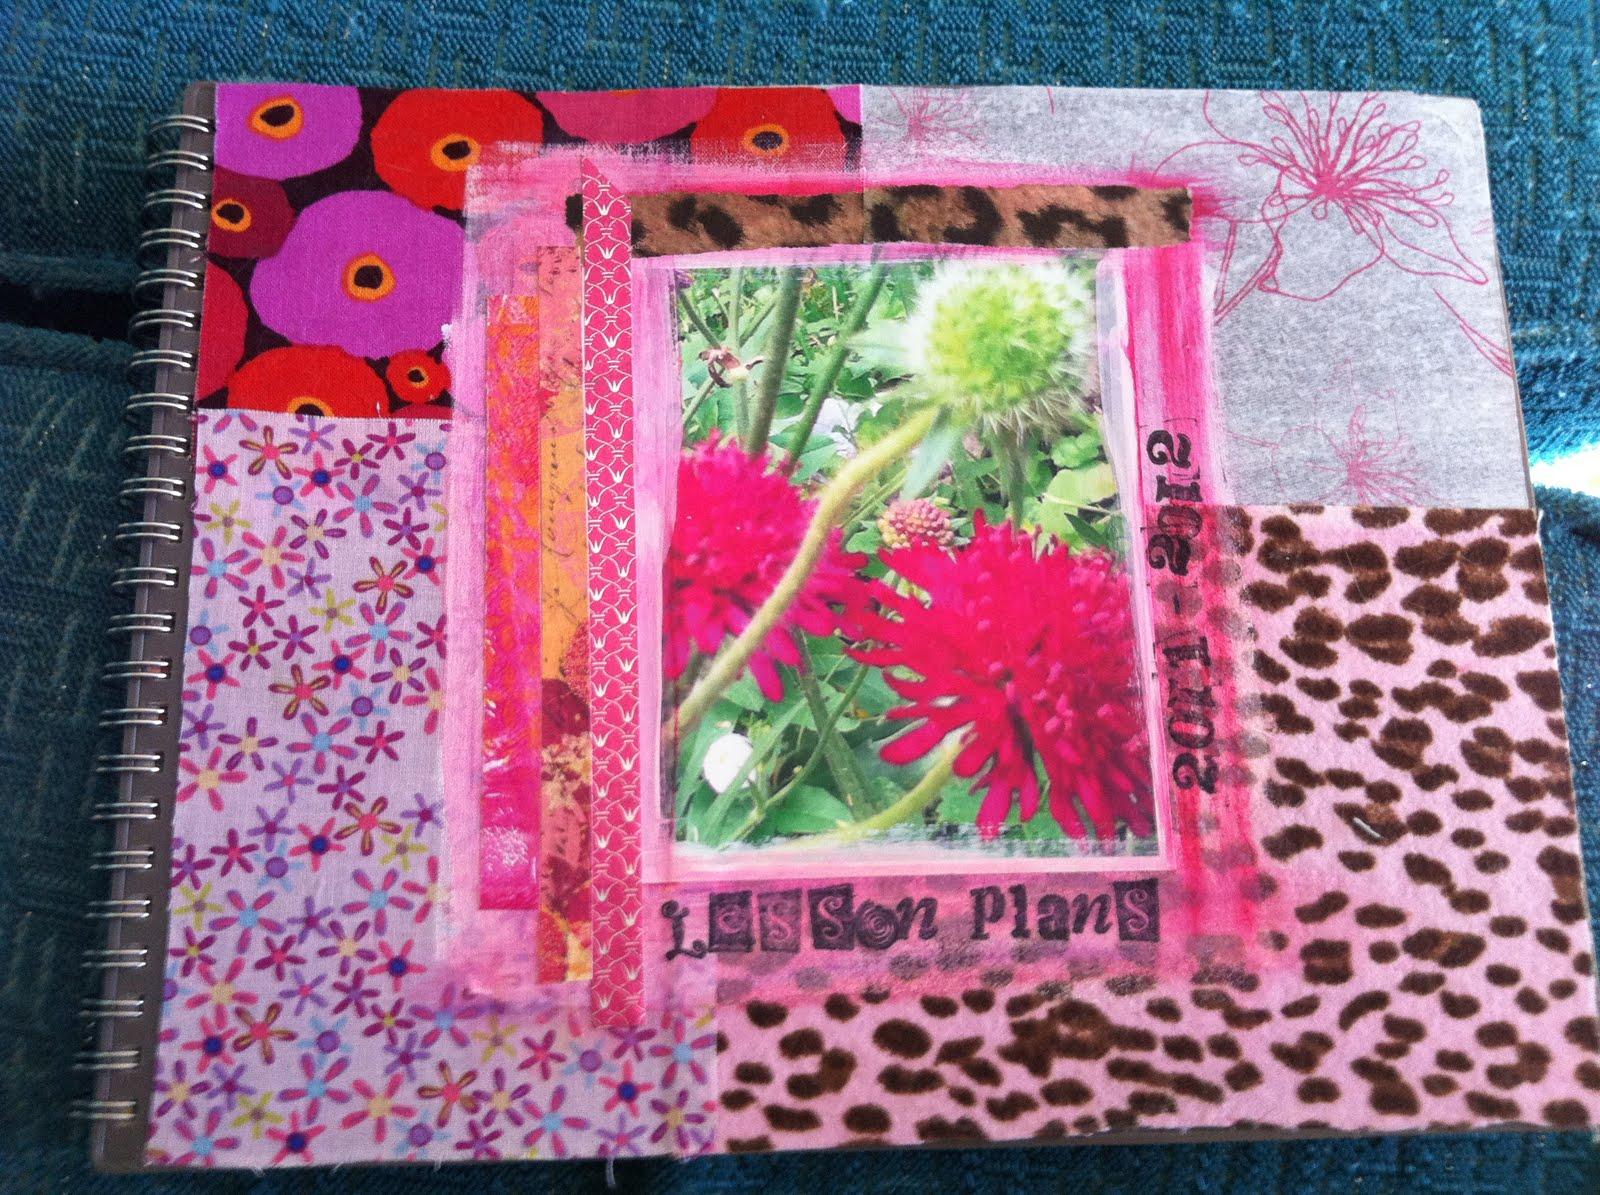 Lilac Luna Creative School Projects